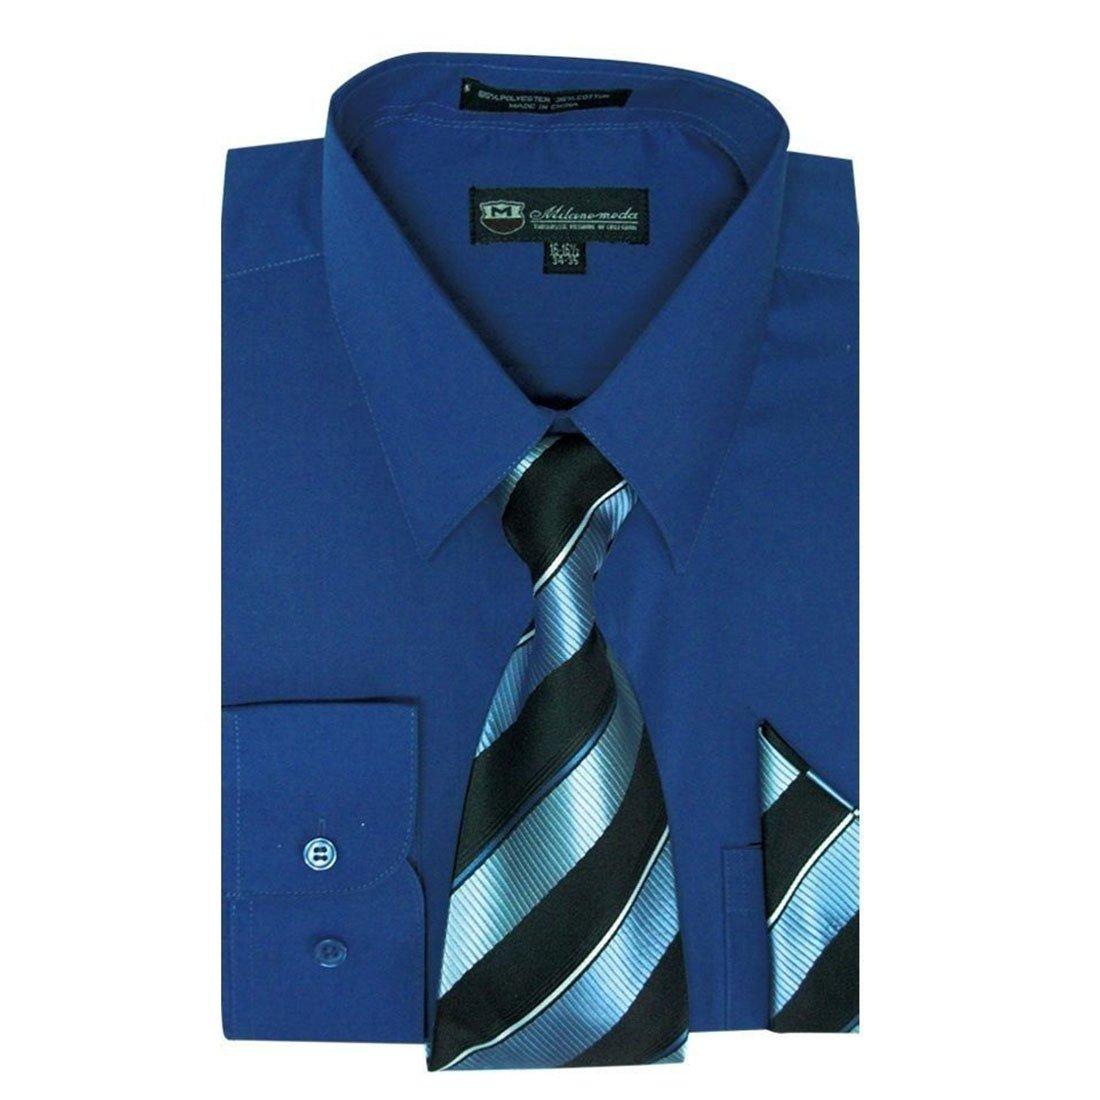 Milano Moda Men's Dress Shirt with Tie/Handkerchief HLSG21A New York Brand